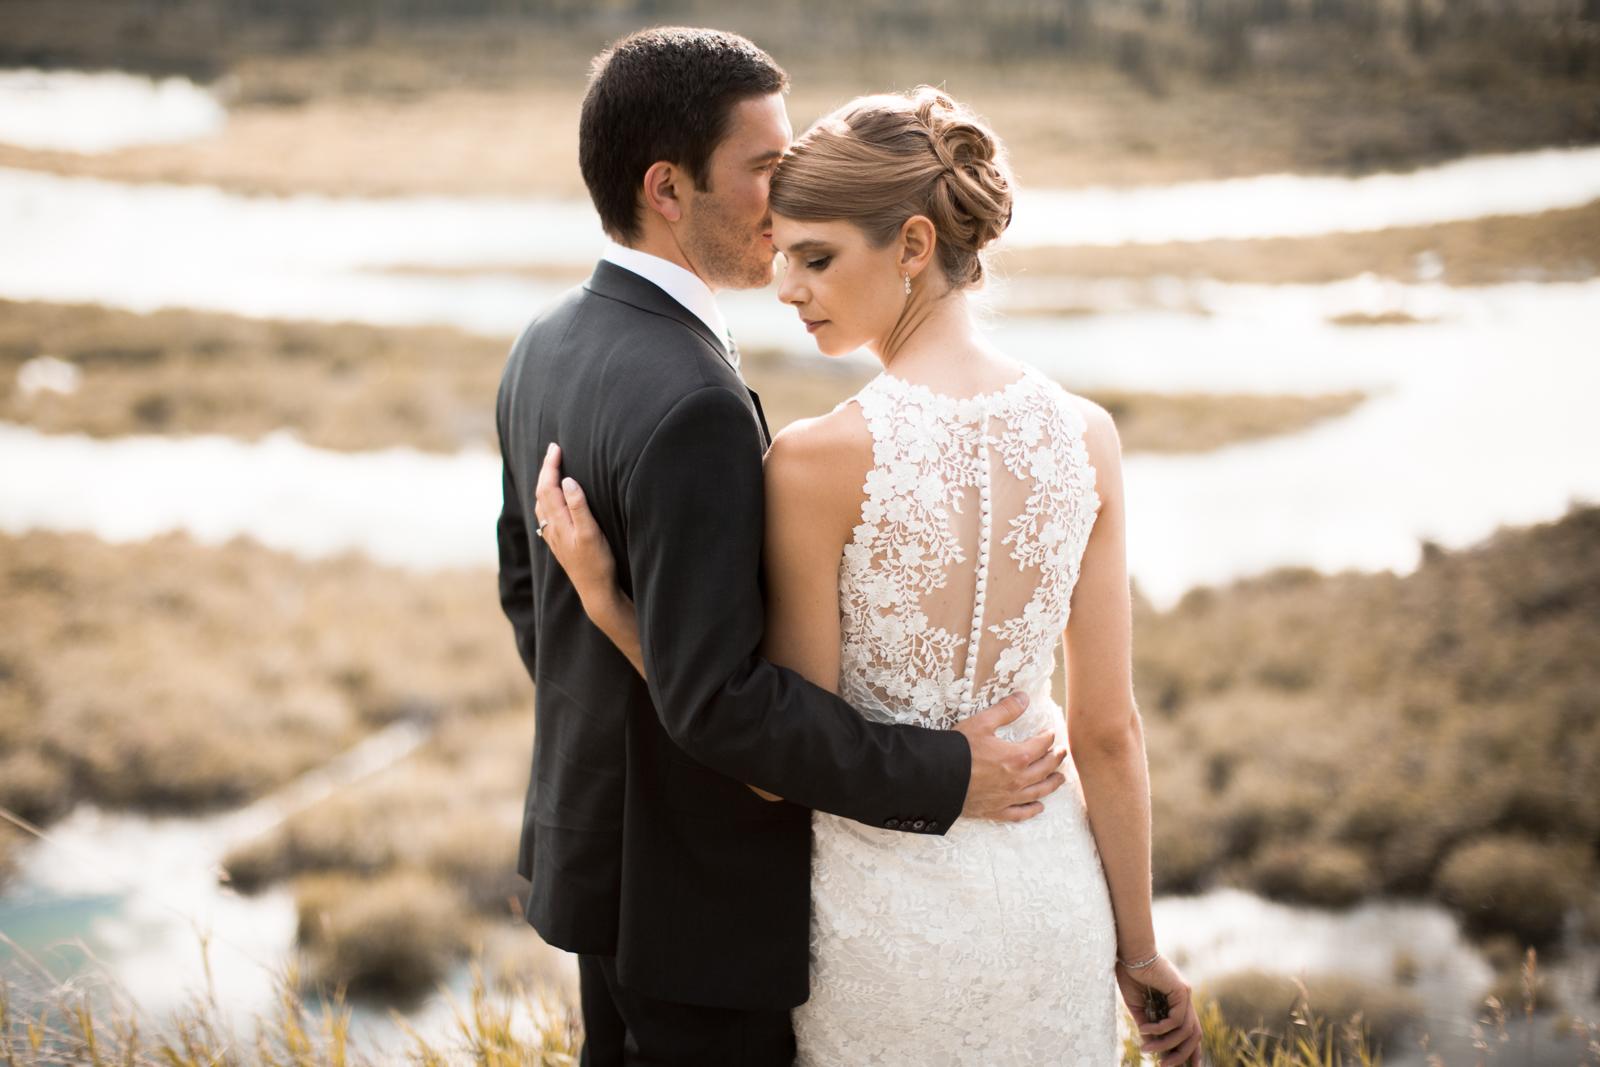 87Andrew_Pavlidis_Photography_Kasia_and_Michael_Calgary_Wedding_Blog-209922